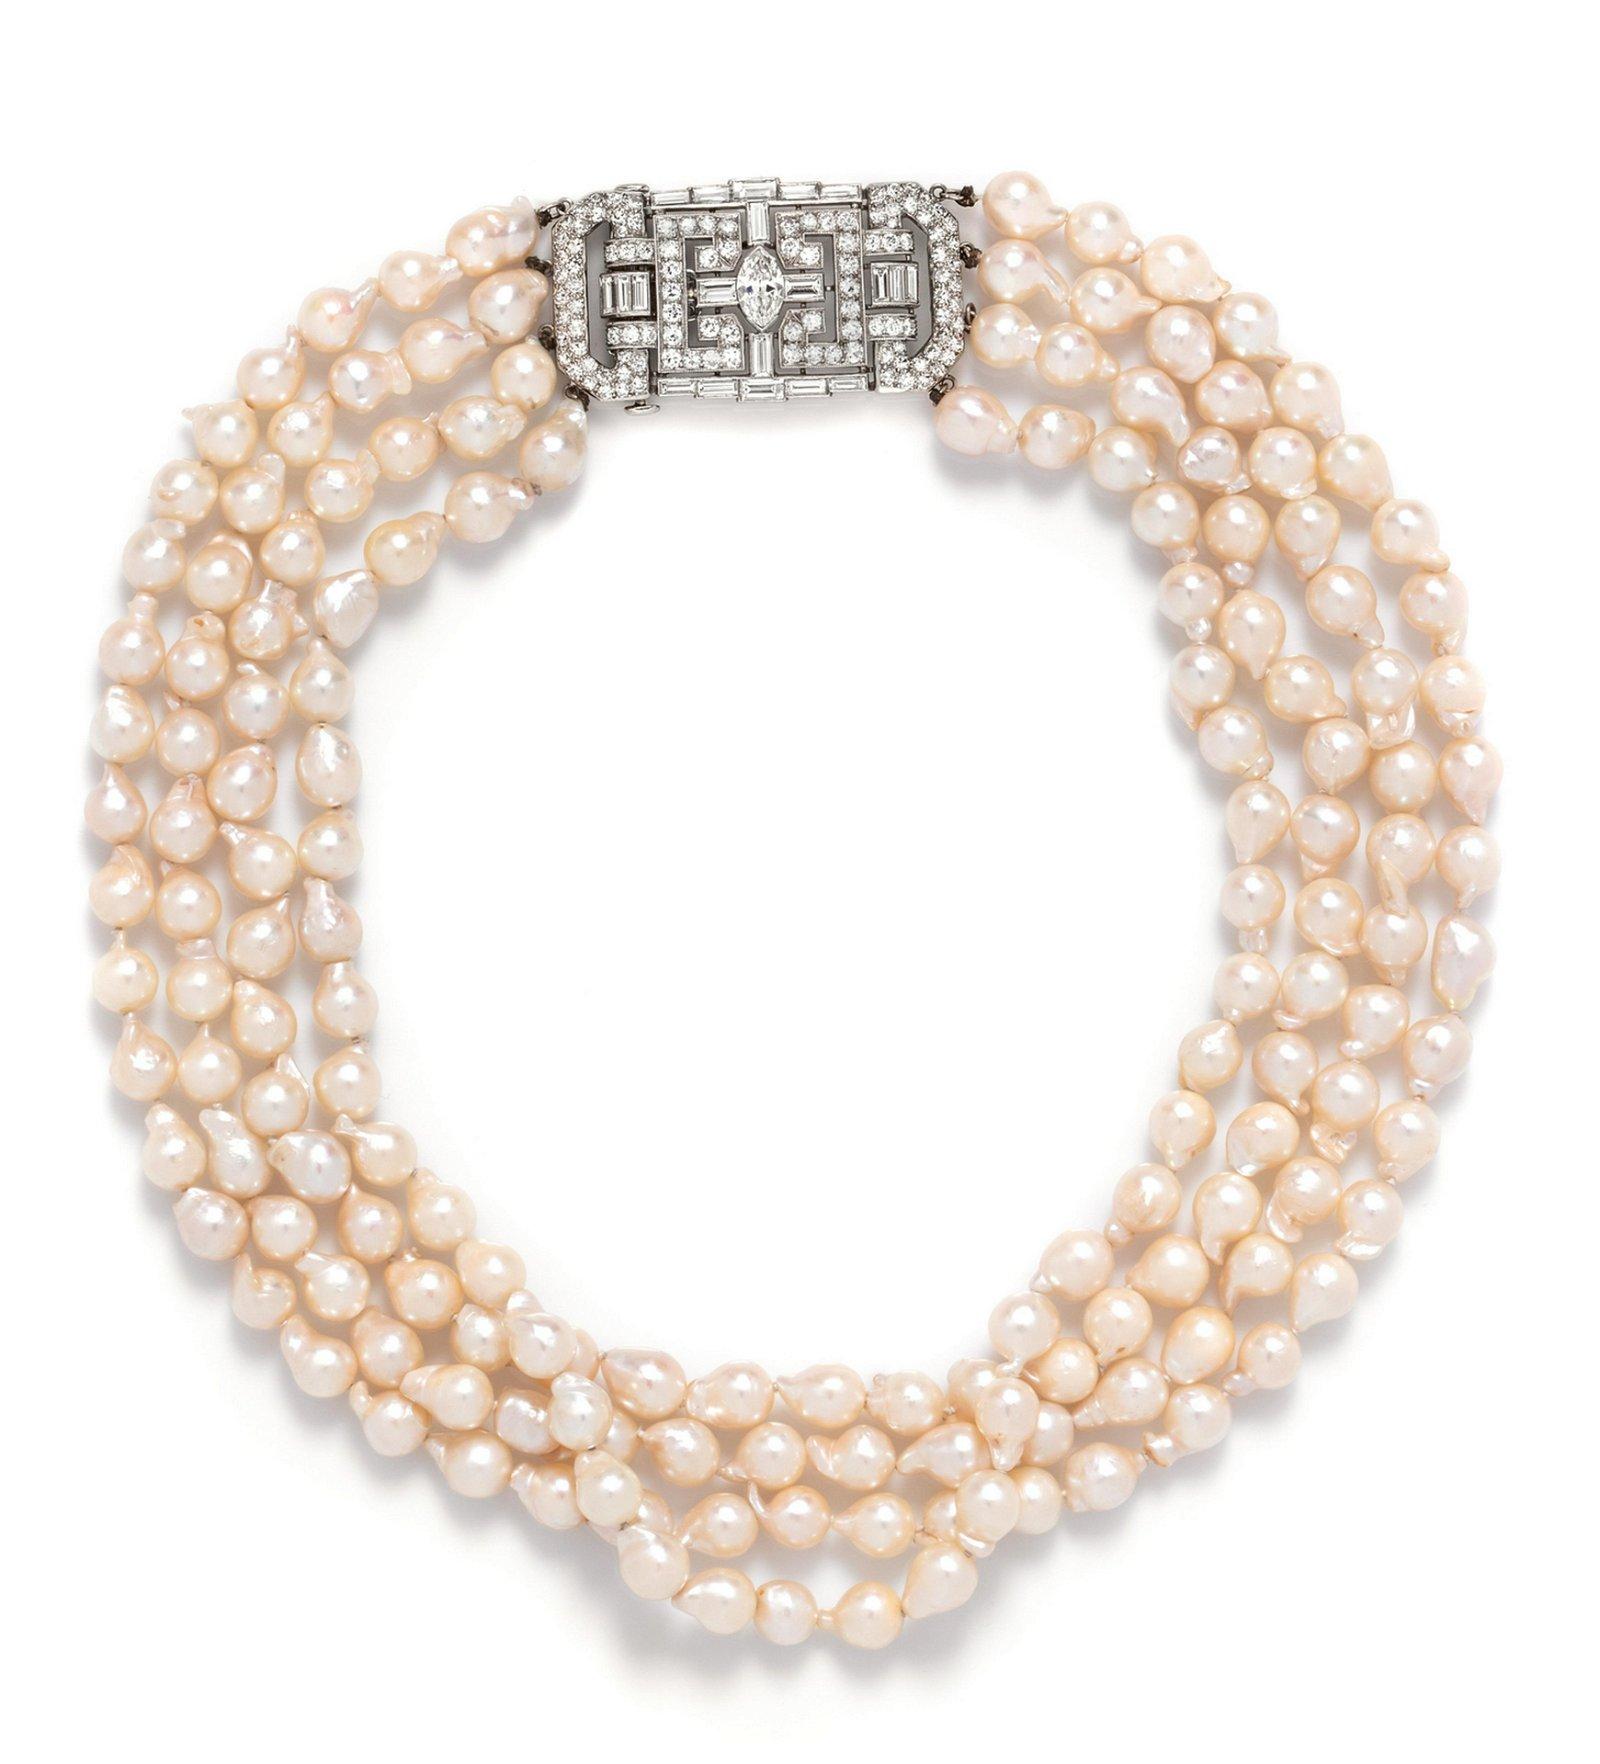 A Platinum, Diamond and Cultured Baroque Pearl